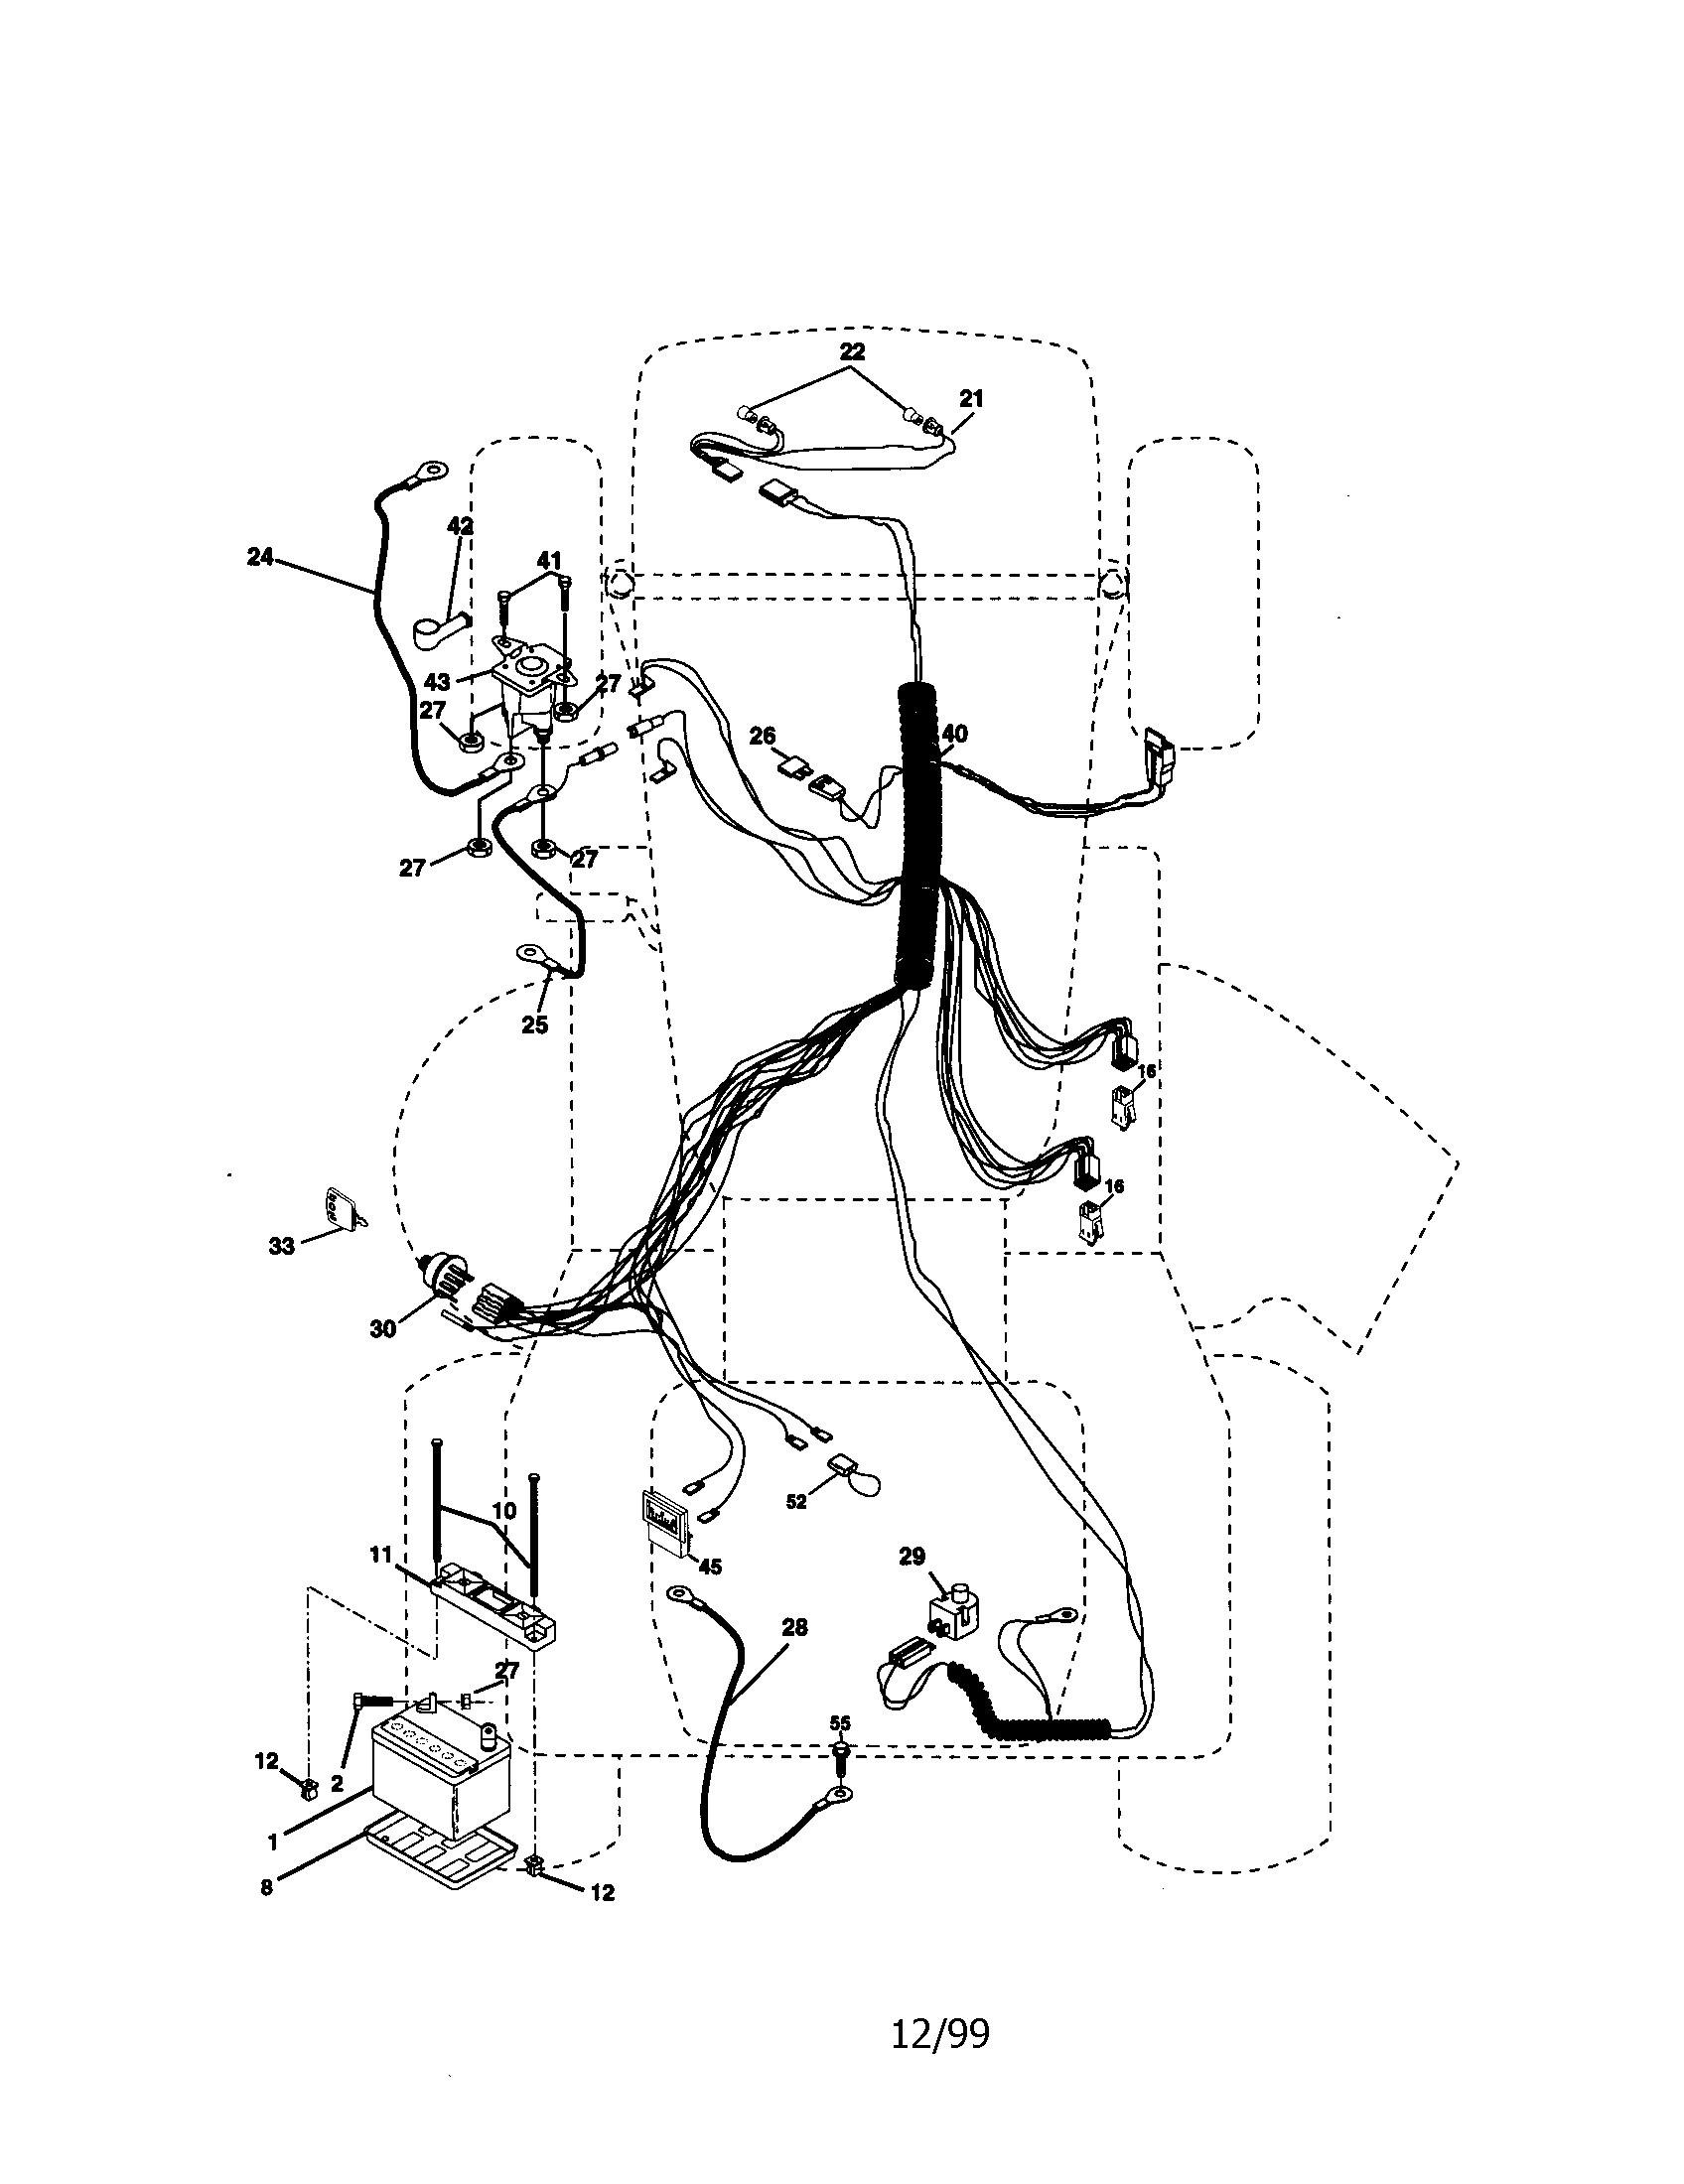 17.5 Hp Craftsman Wiring Diagram Briggs and Stratton 17 5 Hp Engine Diagram Of 17.5 Hp Craftsman Wiring Diagram